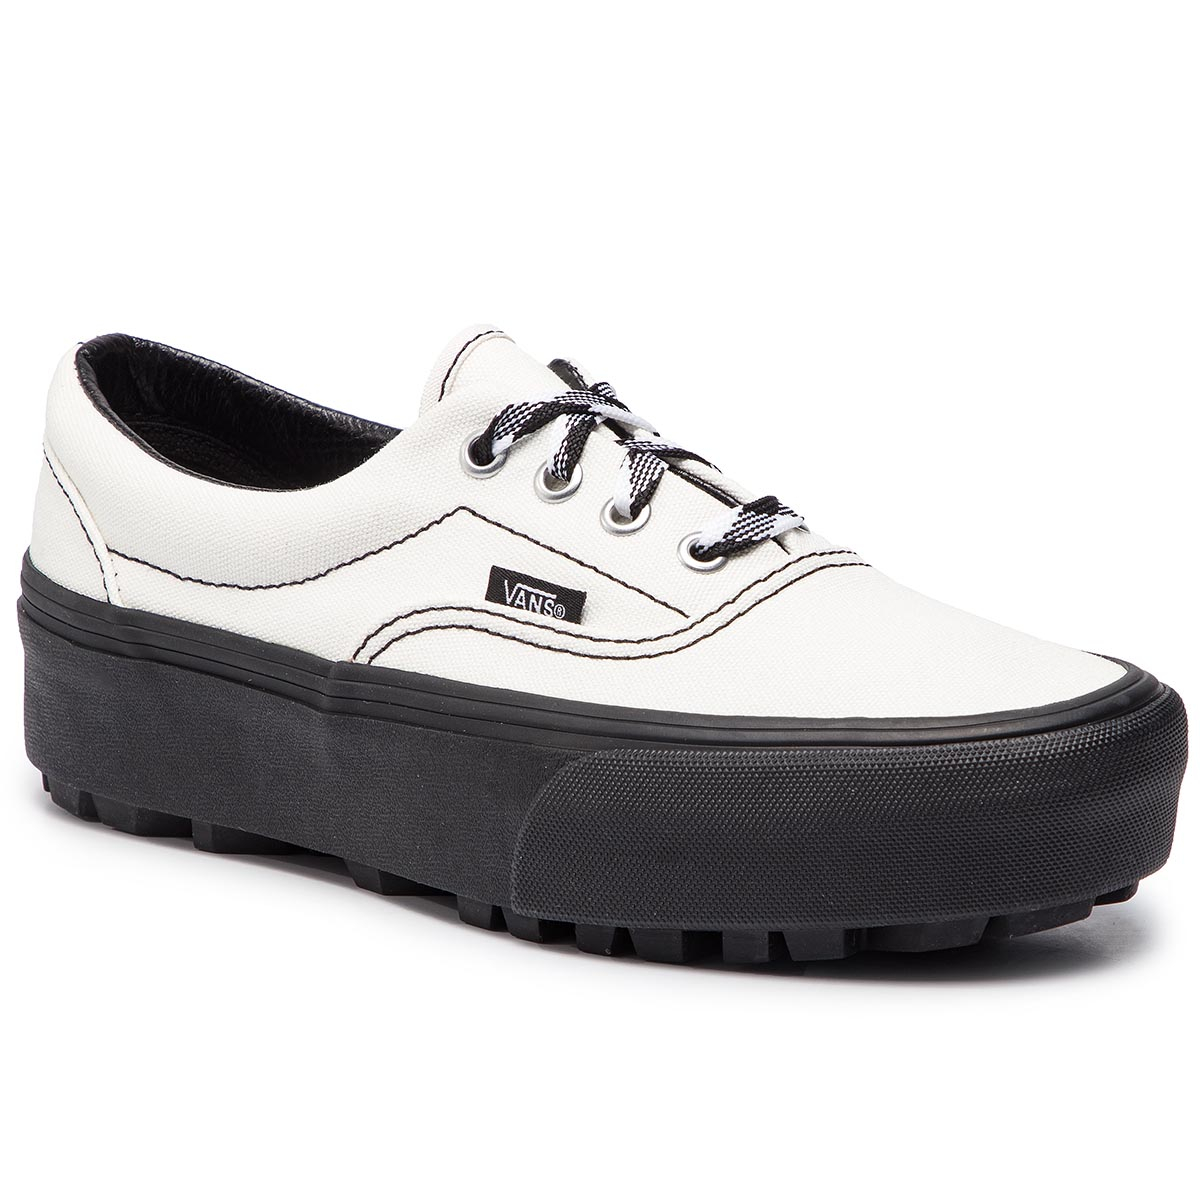 662da477588 Πάνινα παπούτσια VANS - Era Lug Platform VN0A3WLTVPU1 (90s Retro ...